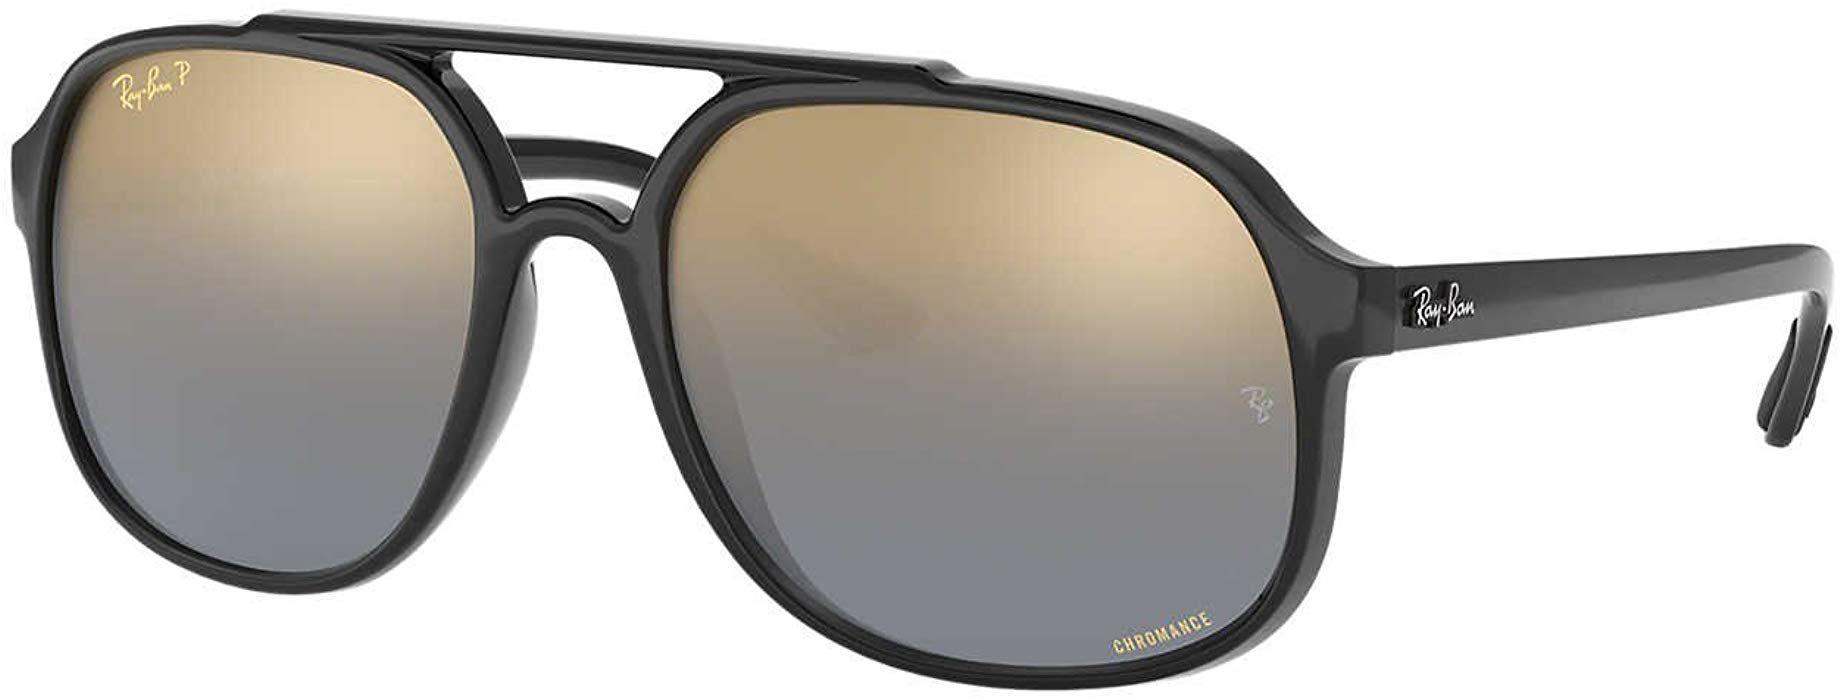 a1edd3a12af Amazon.com  Ray-Ban Men s 0rb4312ch Polarized Iridium Square Sunglasses